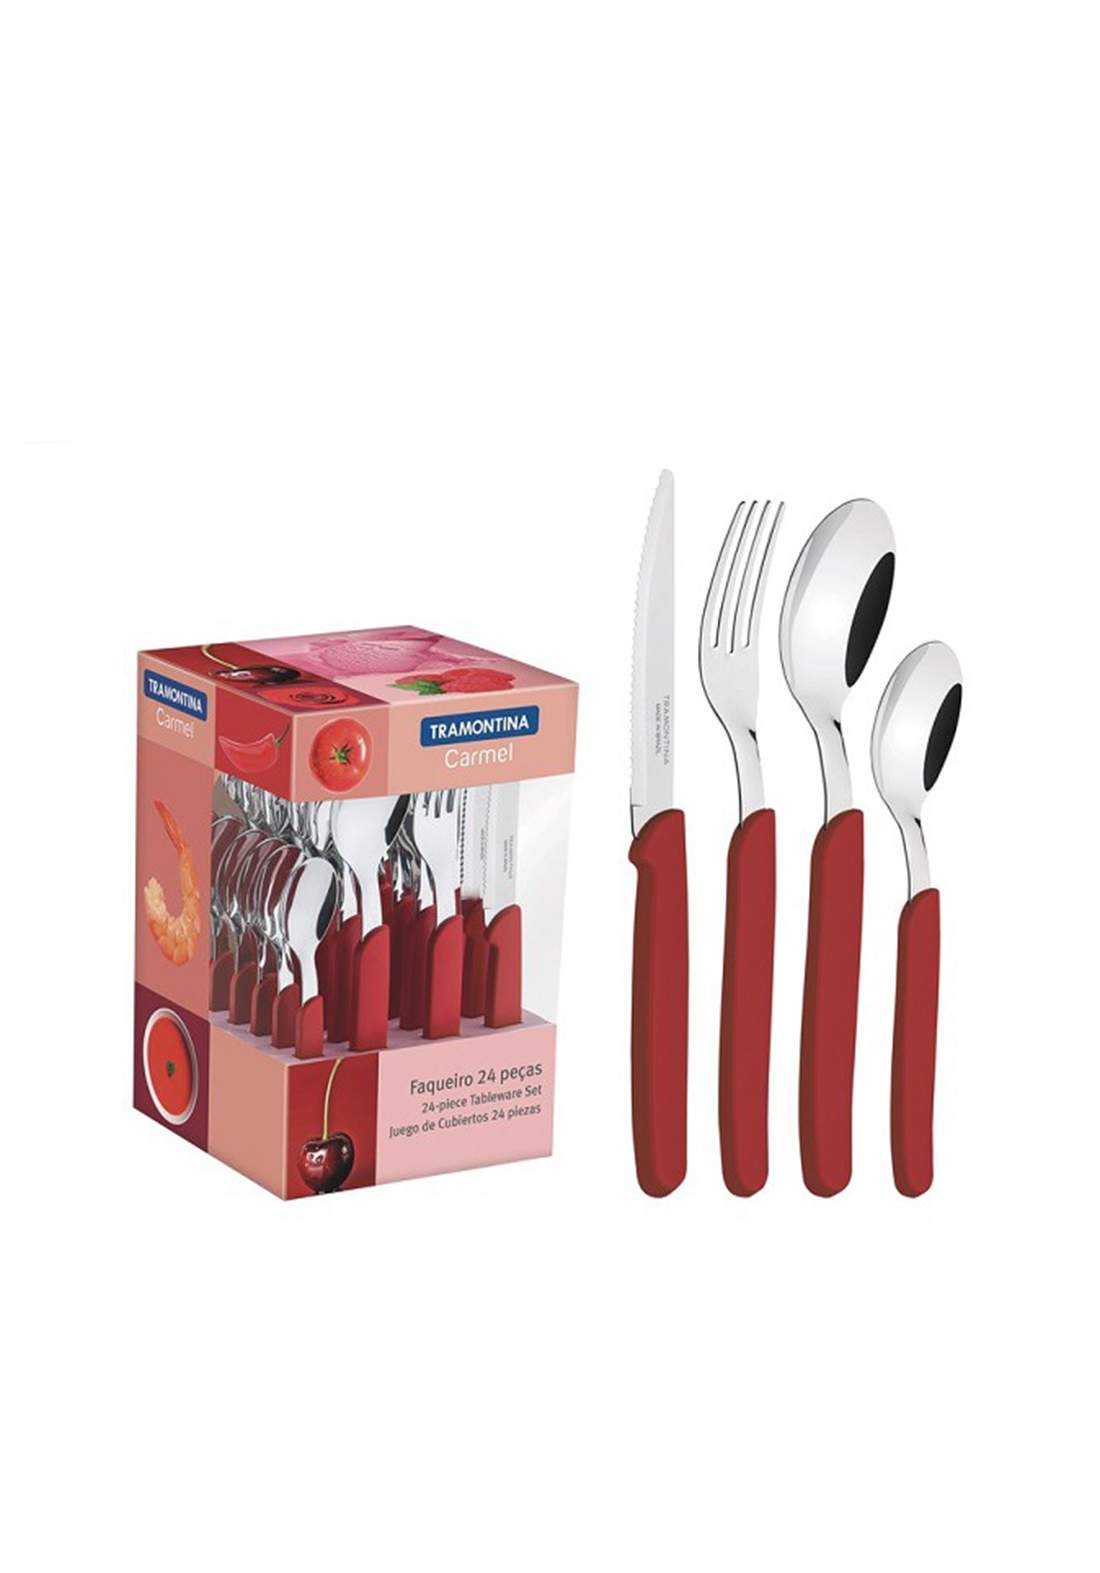 Tramontina 23499-028 Multiply 24 Piece Cutlery Set Red طقم ادوات المطبخ